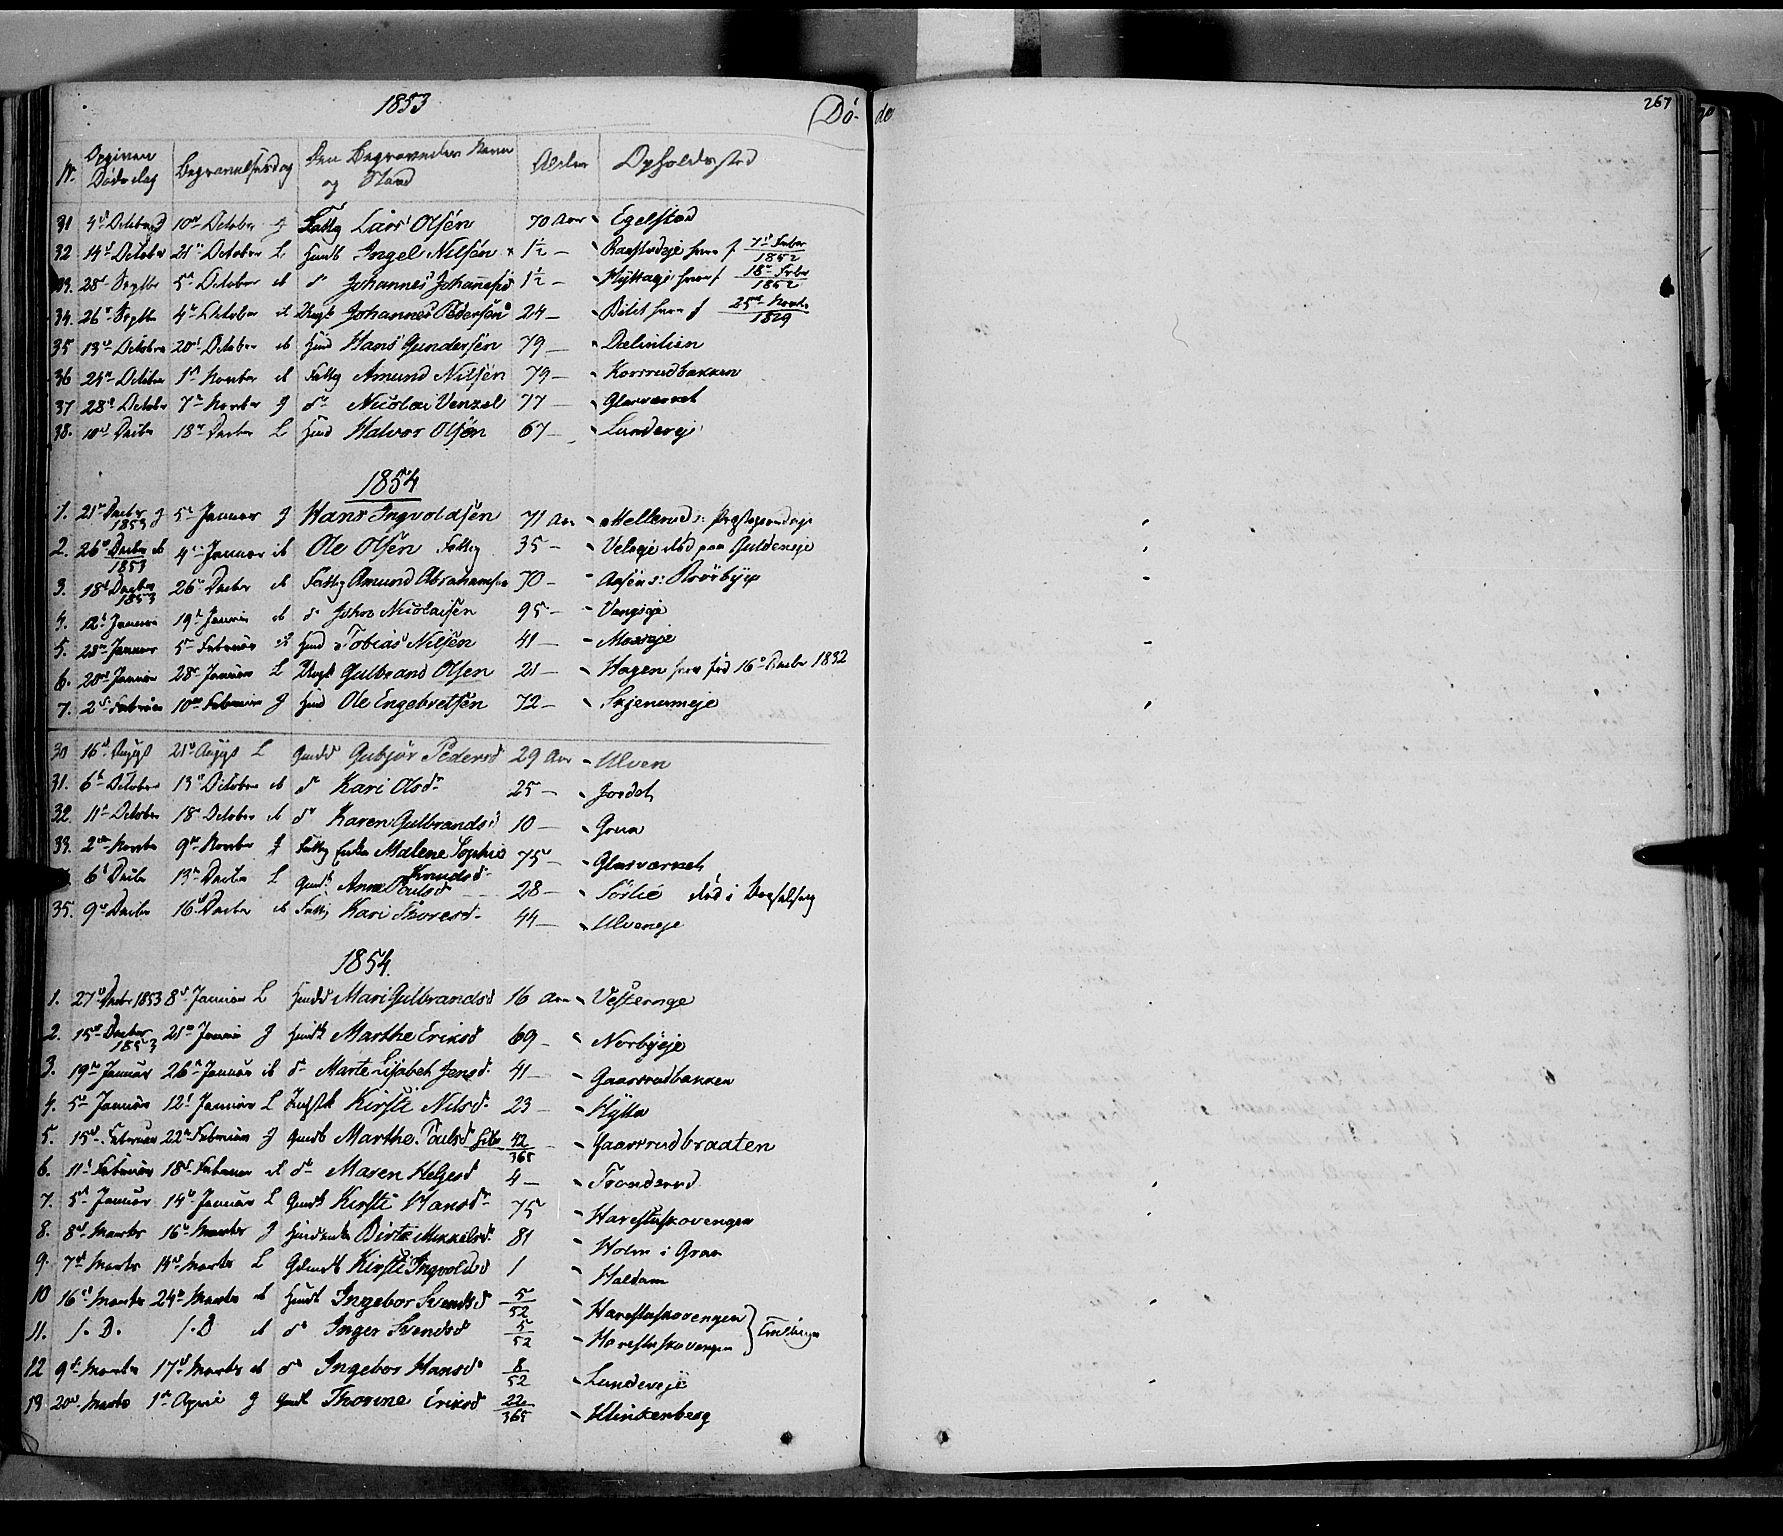 SAH, Jevnaker prestekontor, Ministerialbok nr. 6, 1837-1857, s. 267